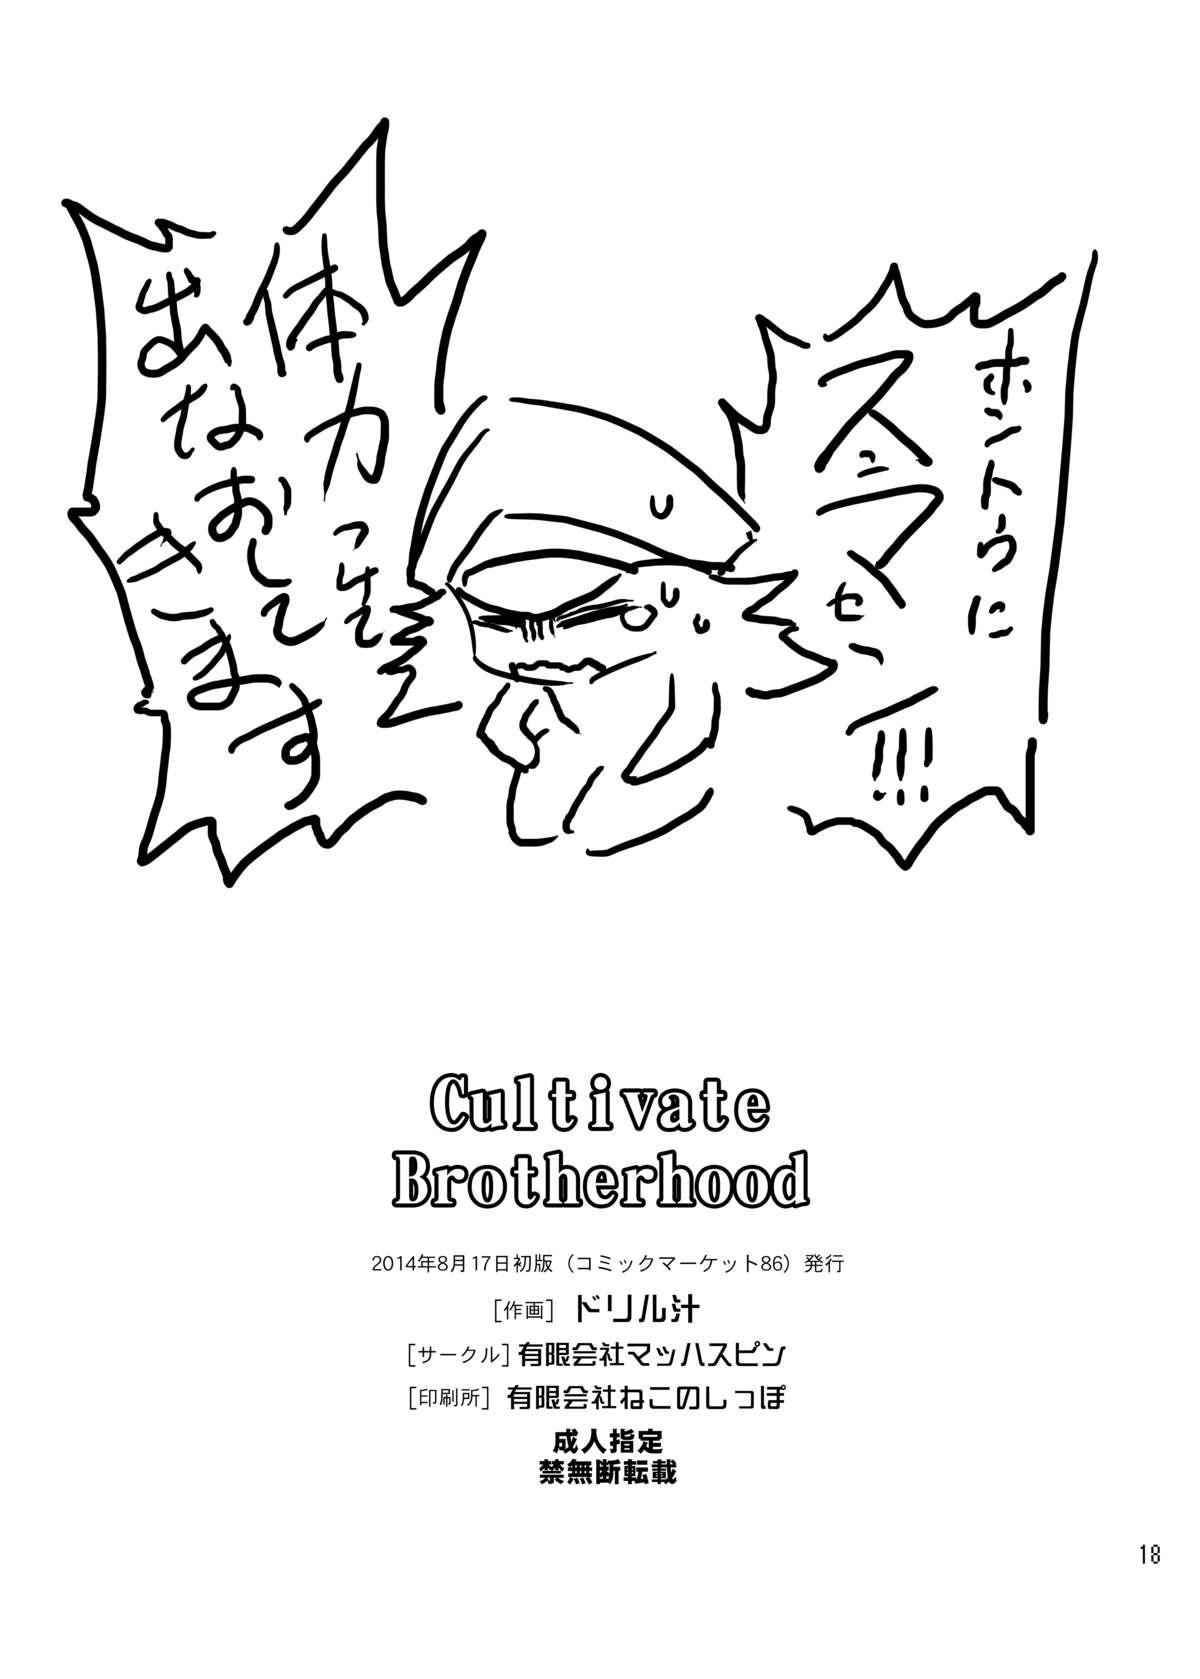 Cultivate Brotherhood 14